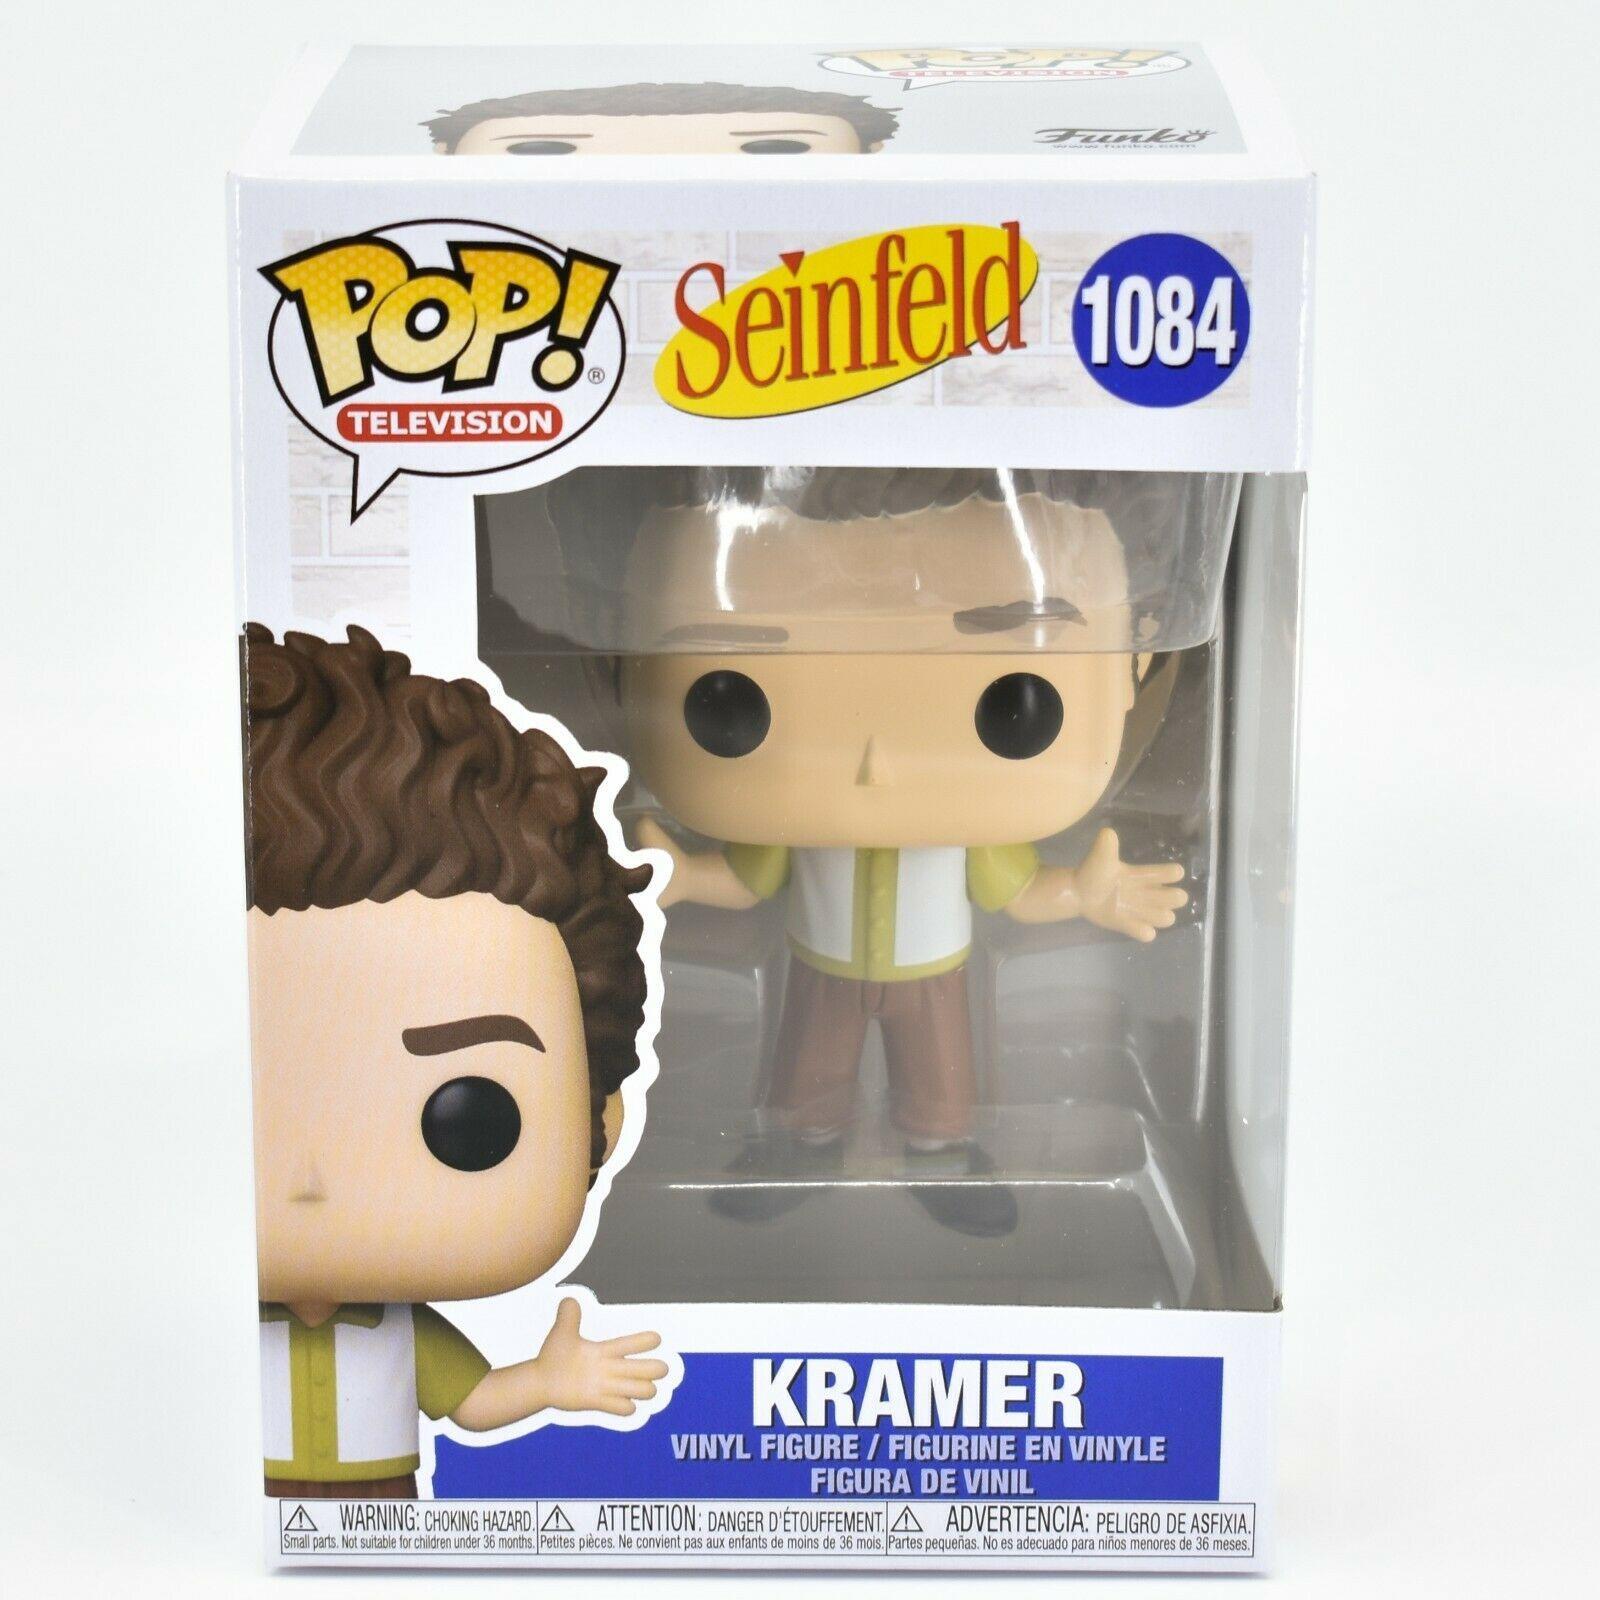 Funko Pop! Television Seinfeld Kramer #1084 Vinyl Action Figure